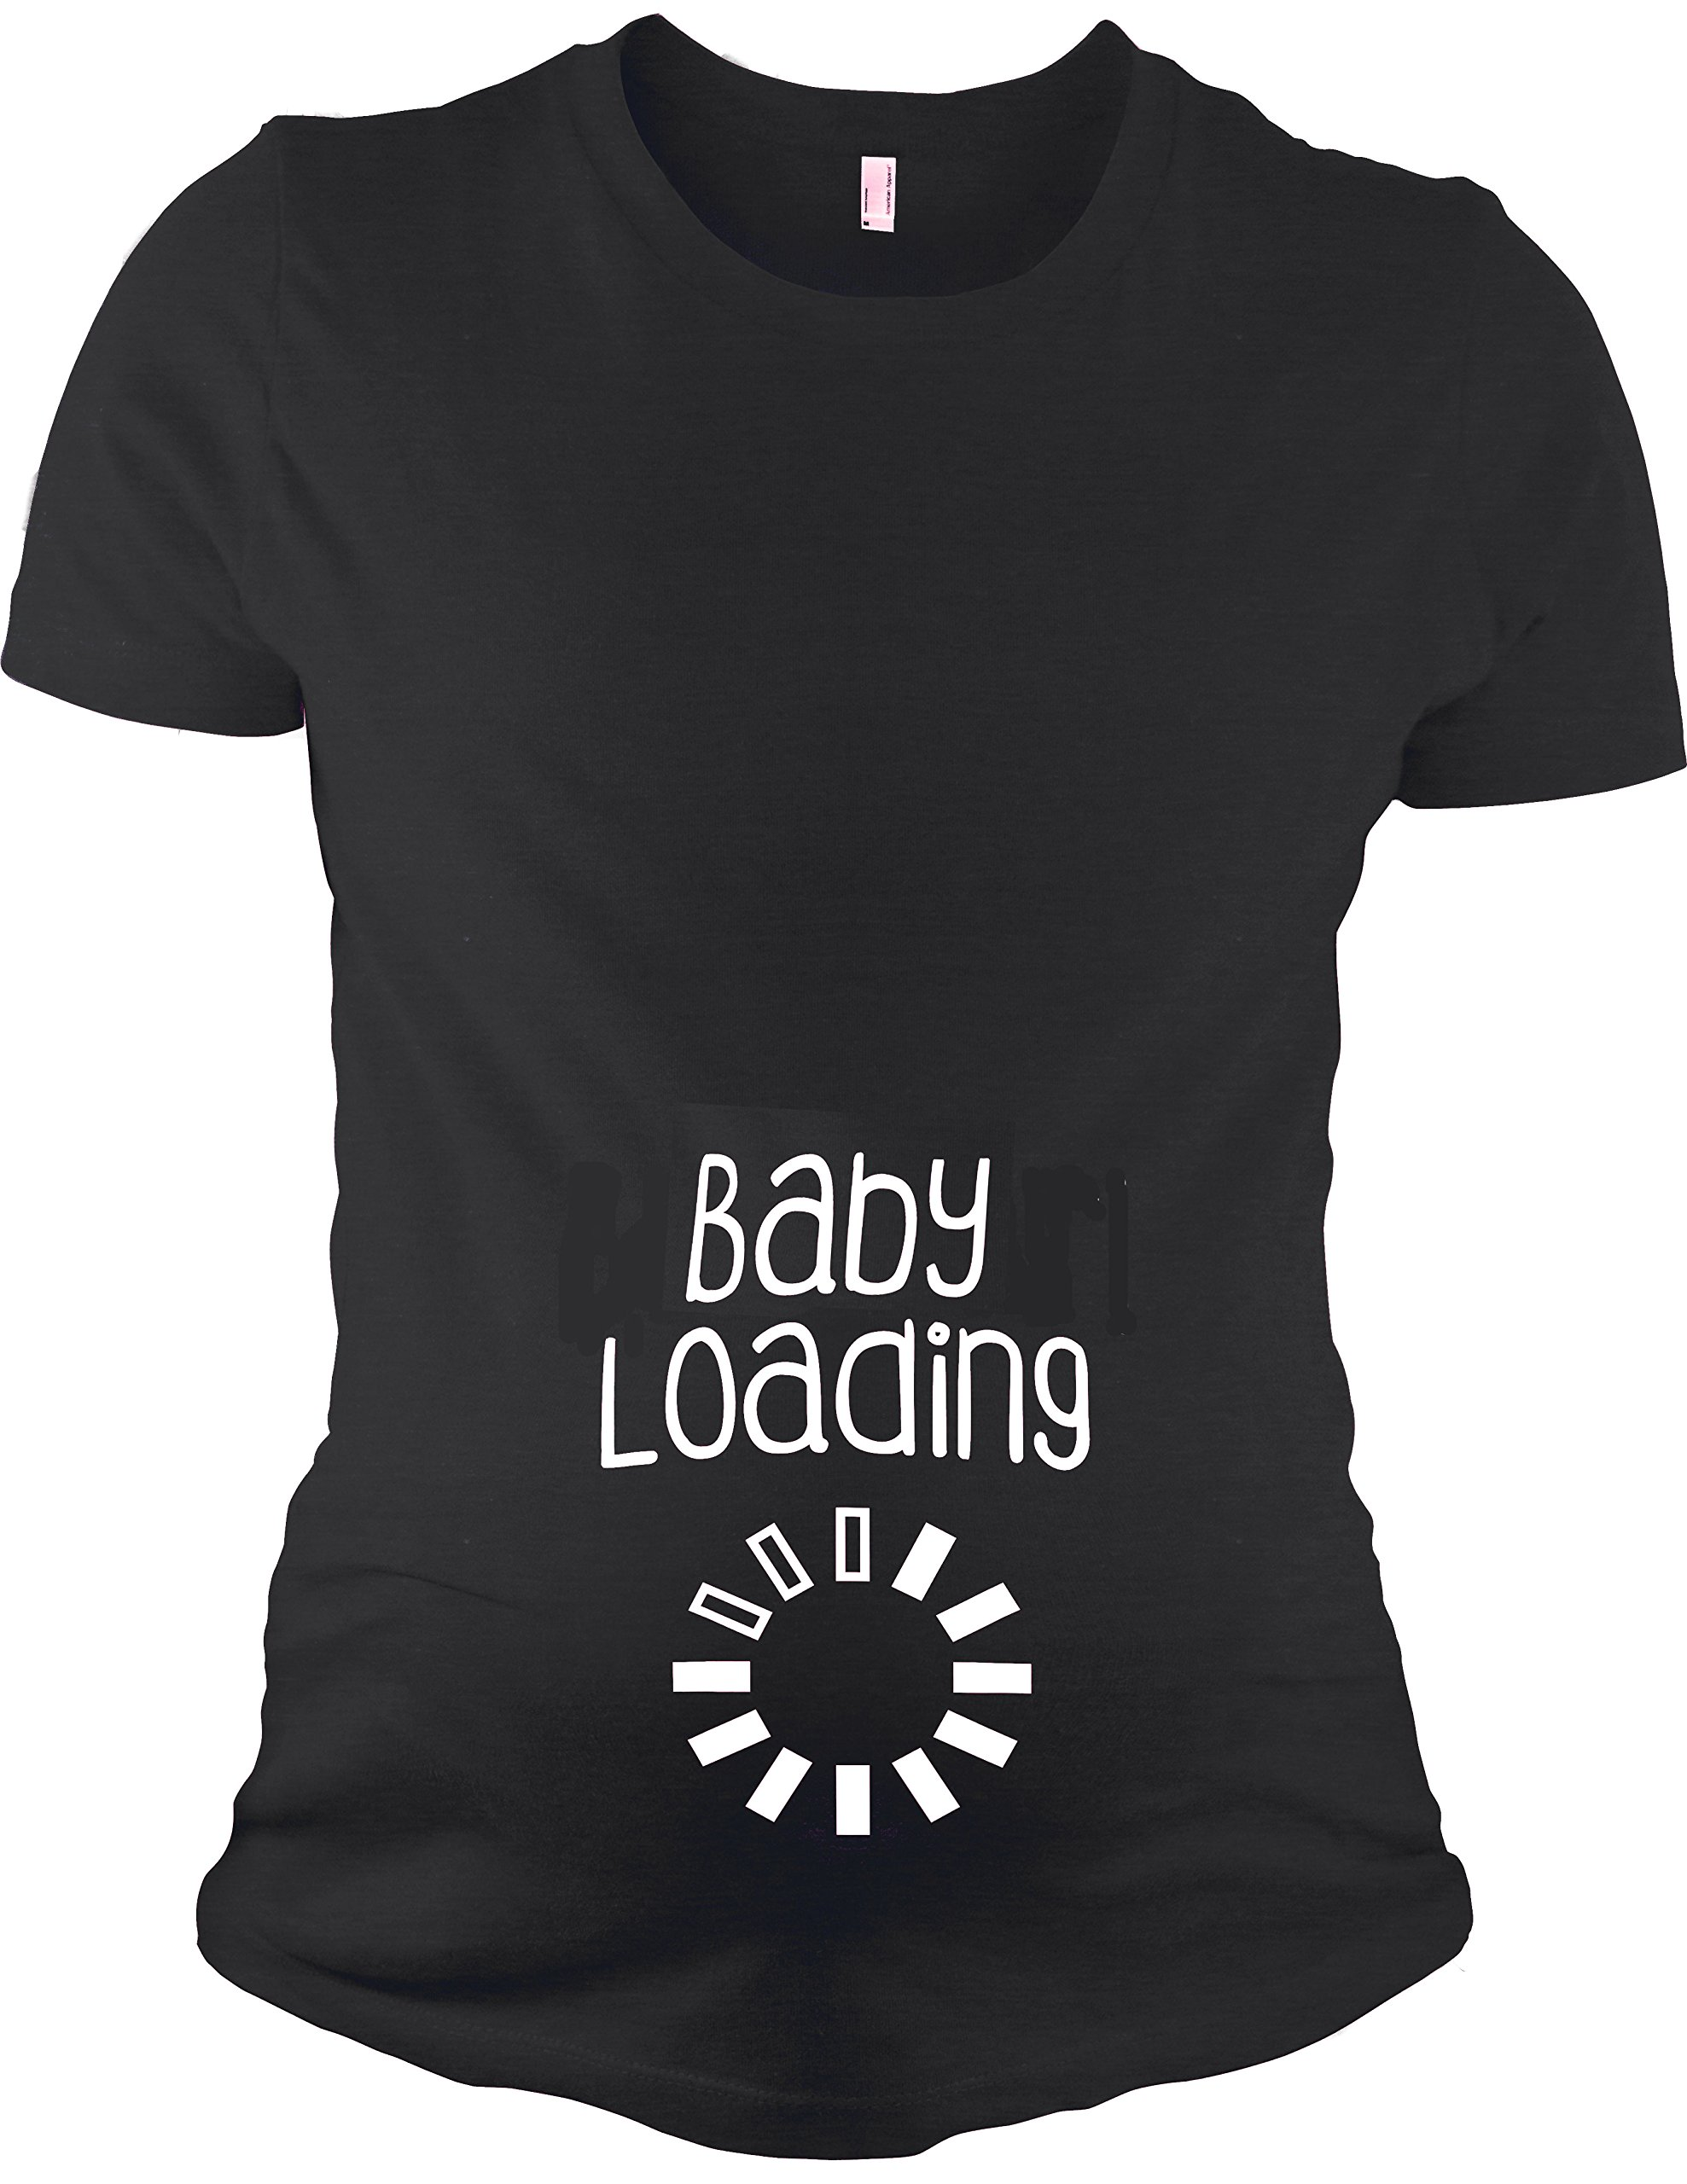 Maternity Short Sleeve T-Shirt - Baby Loading, Black, L